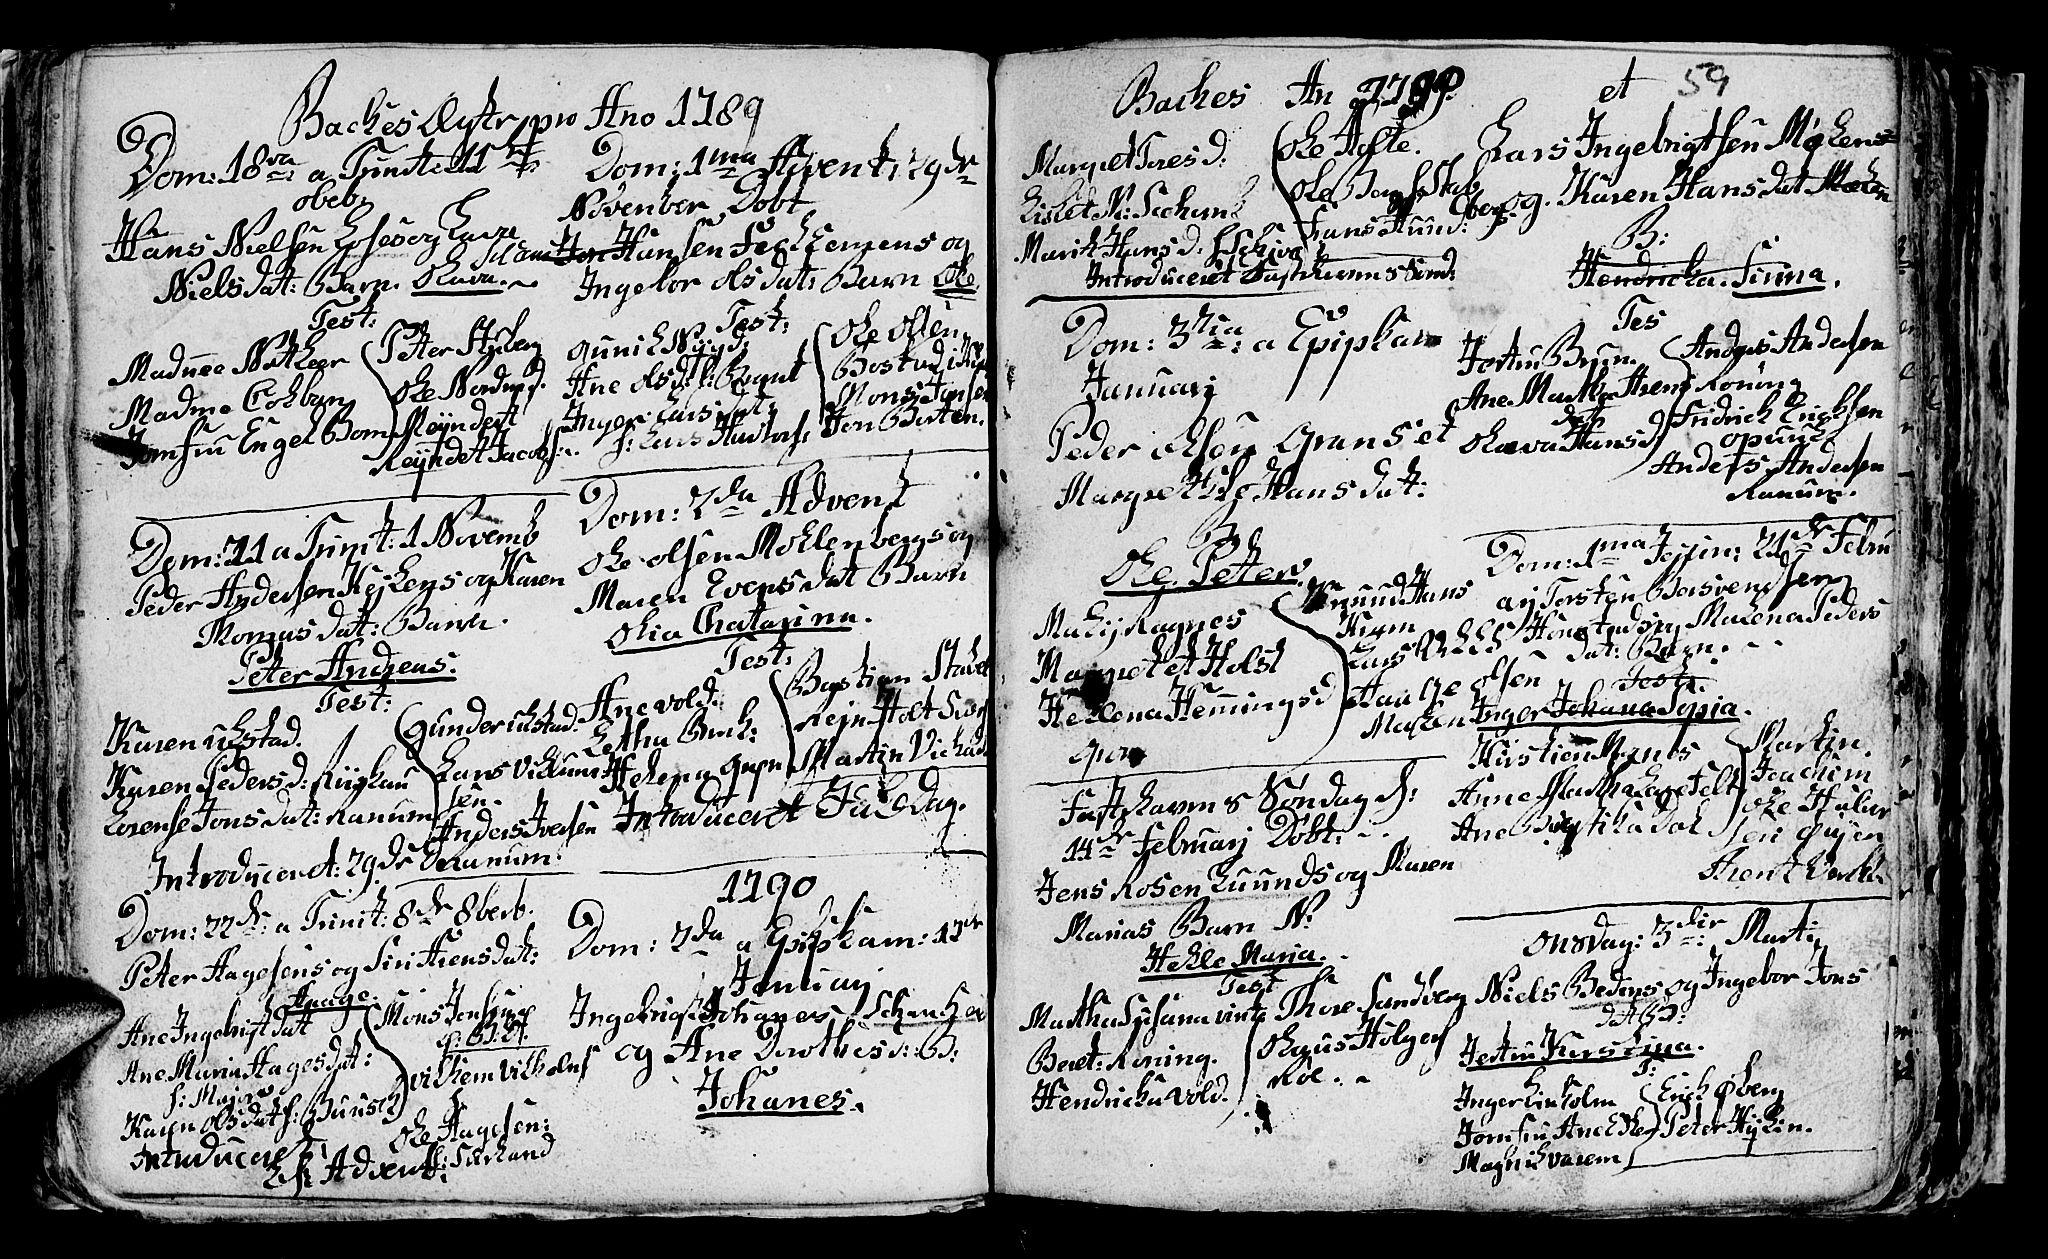 SAT, Ministerialprotokoller, klokkerbøker og fødselsregistre - Sør-Trøndelag, 604/L0218: Parish register (copy) no. 604C01, 1754-1819, p. 59